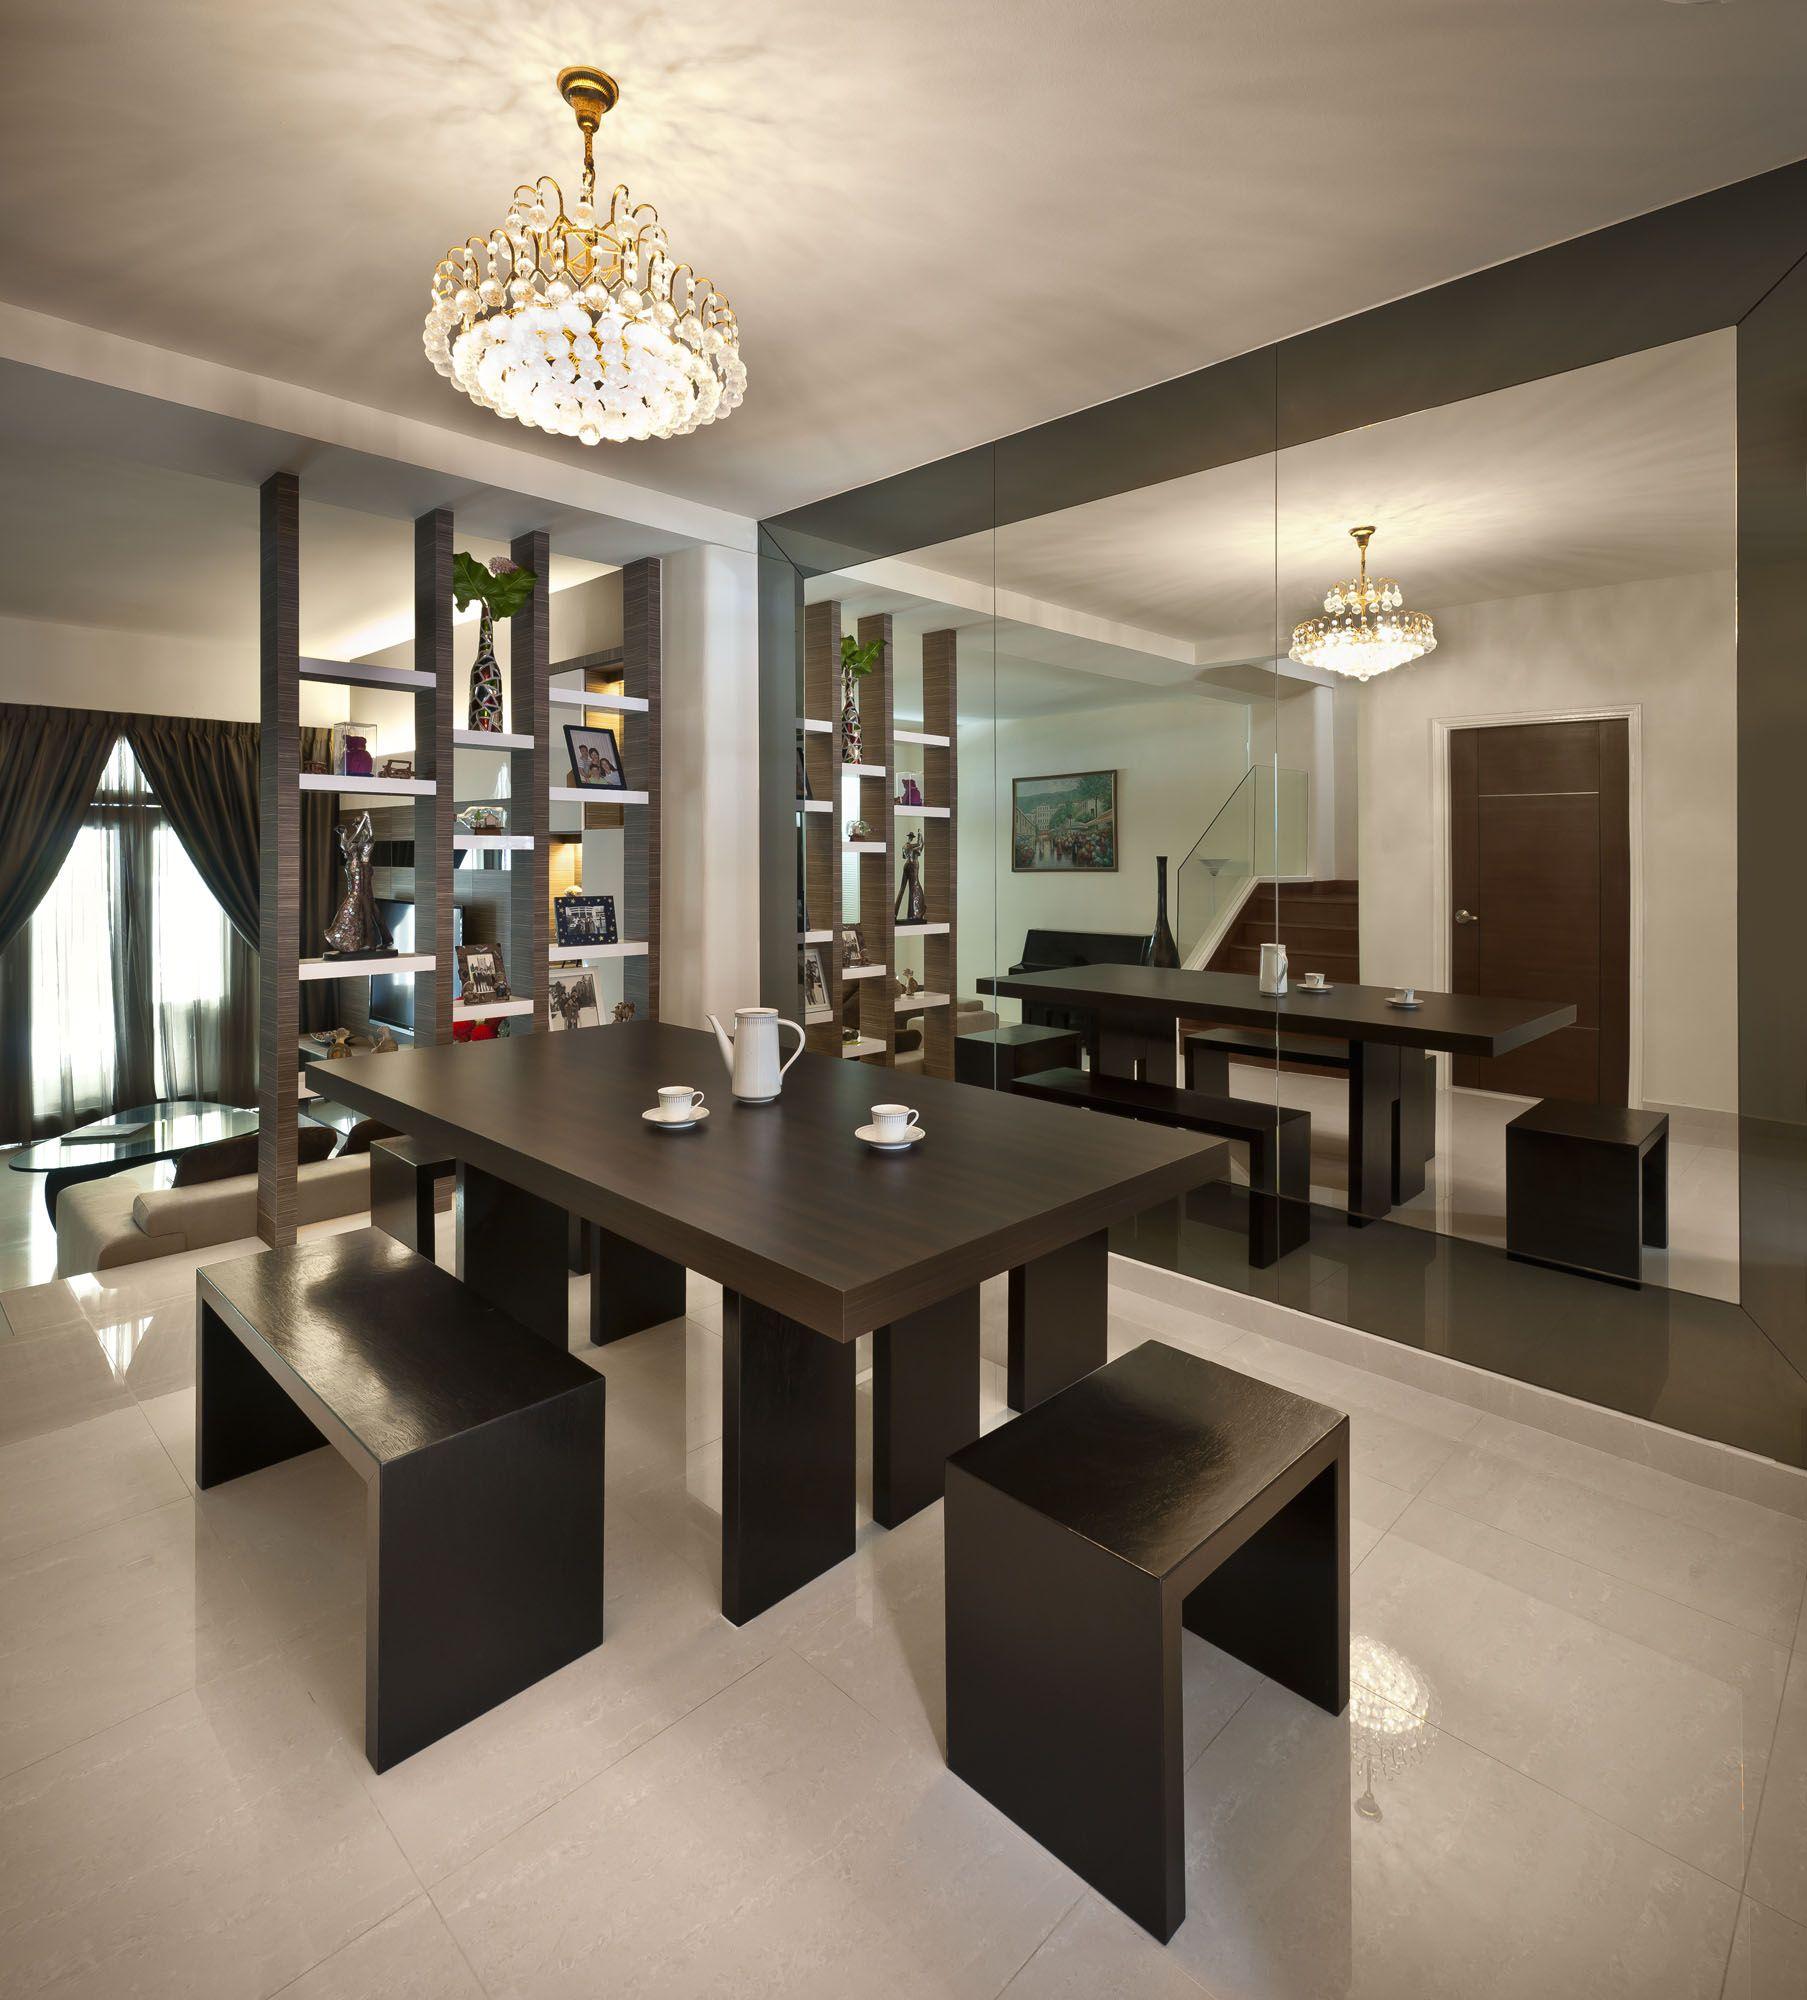 Singapore Modern Dining Hall Design Google Search Hall Interior Design Interior Design Hall Interior